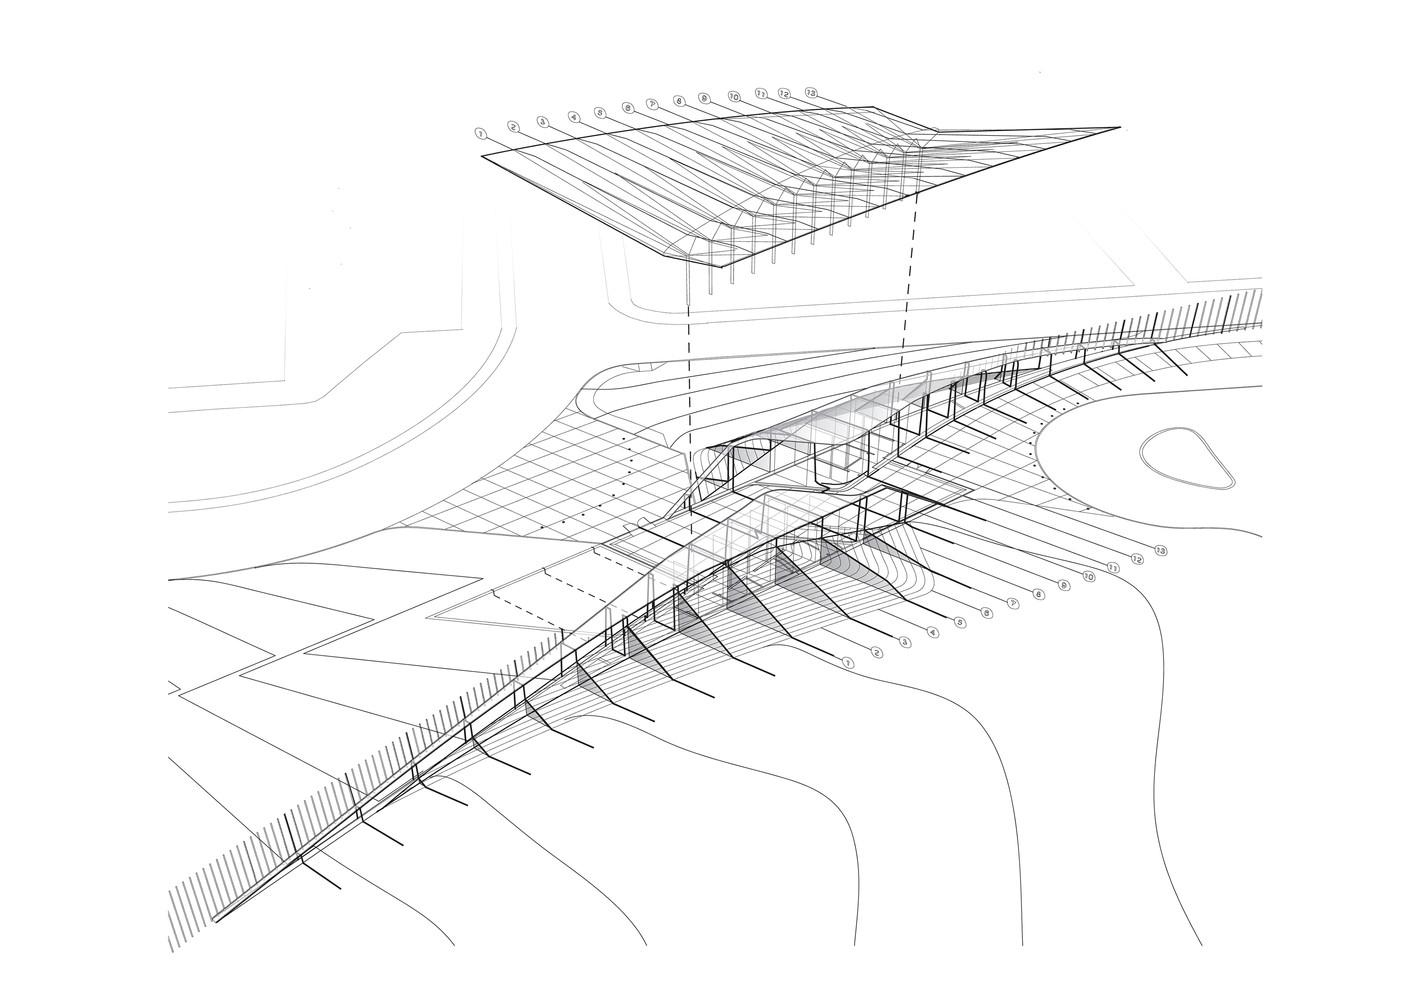 medium resolution of novartis campus weiss manfredi novartis visitor reception serial section diagram